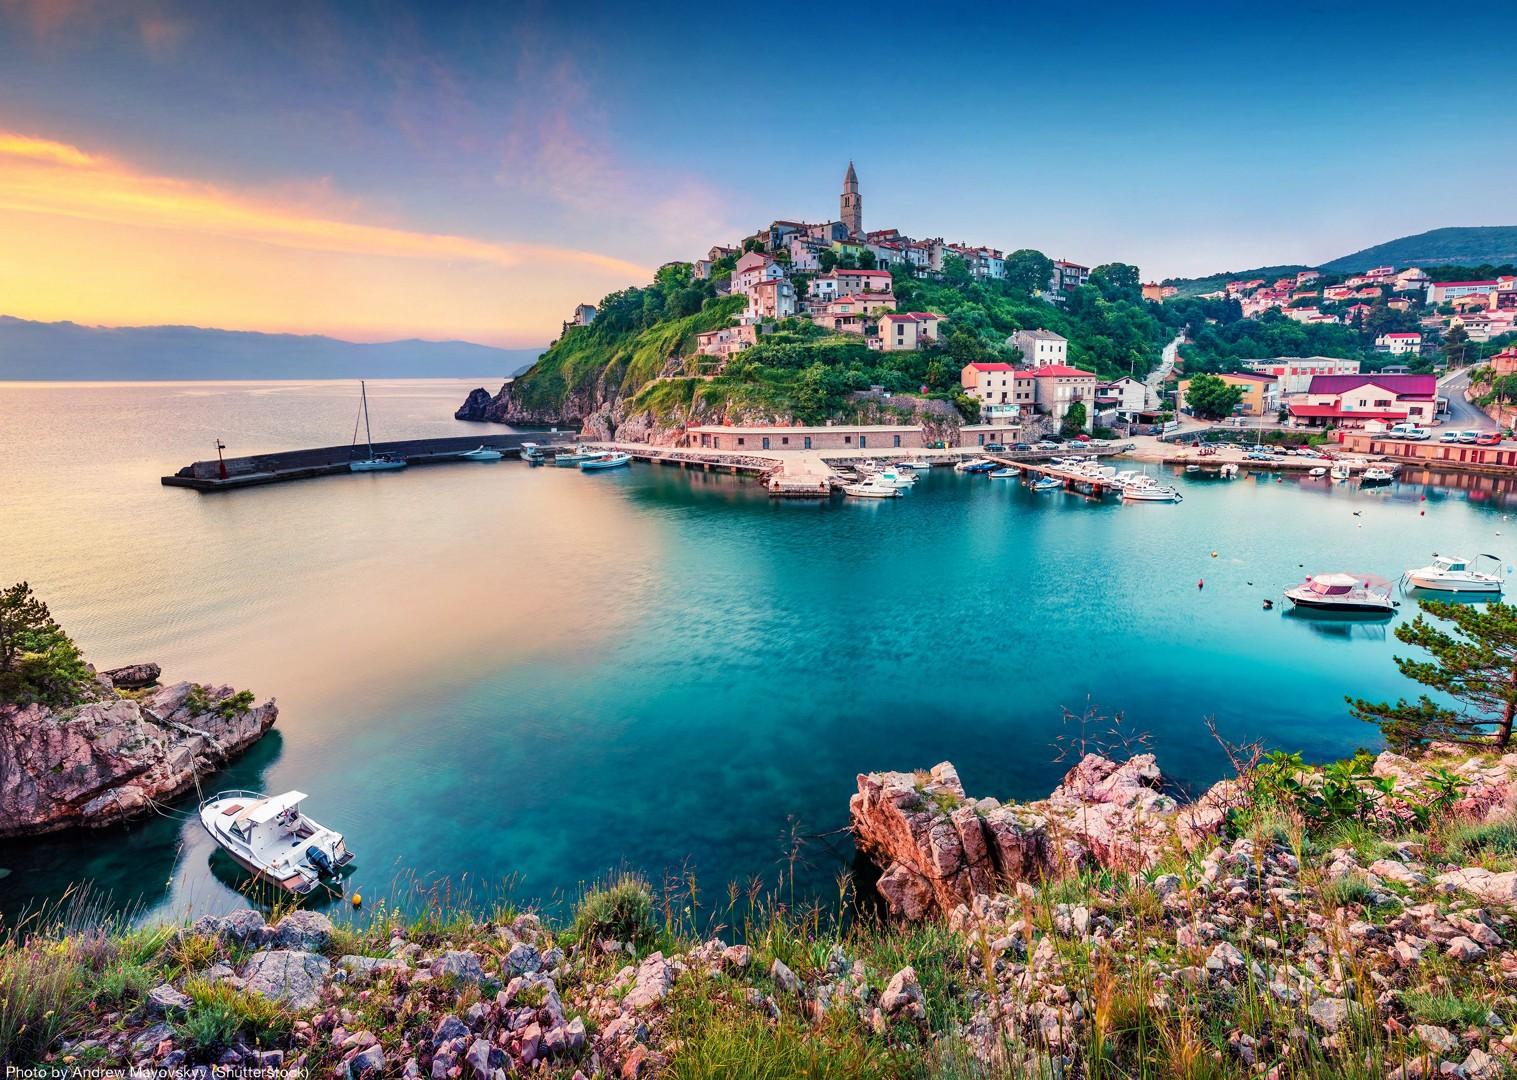 mali-losinj-town-croatia-saddle-skedaddle-cycle.jpg - Croatia - Kvarner Bay - Bike and Boat Holiday - Leisure Cycling